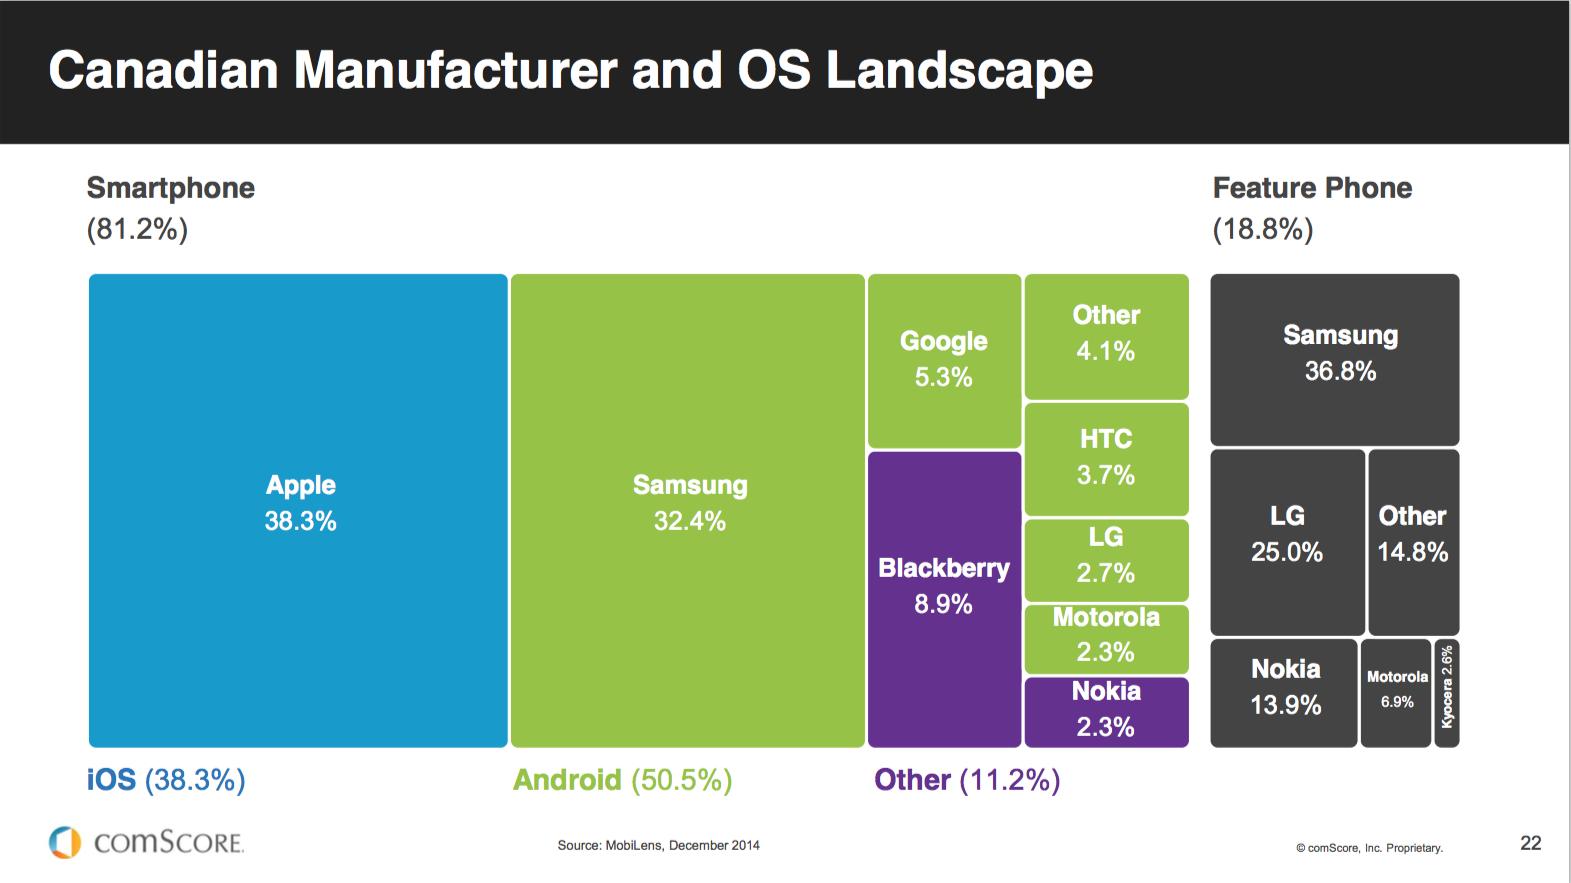 In Canada, iPhone has 38% of the 81% of smartphones